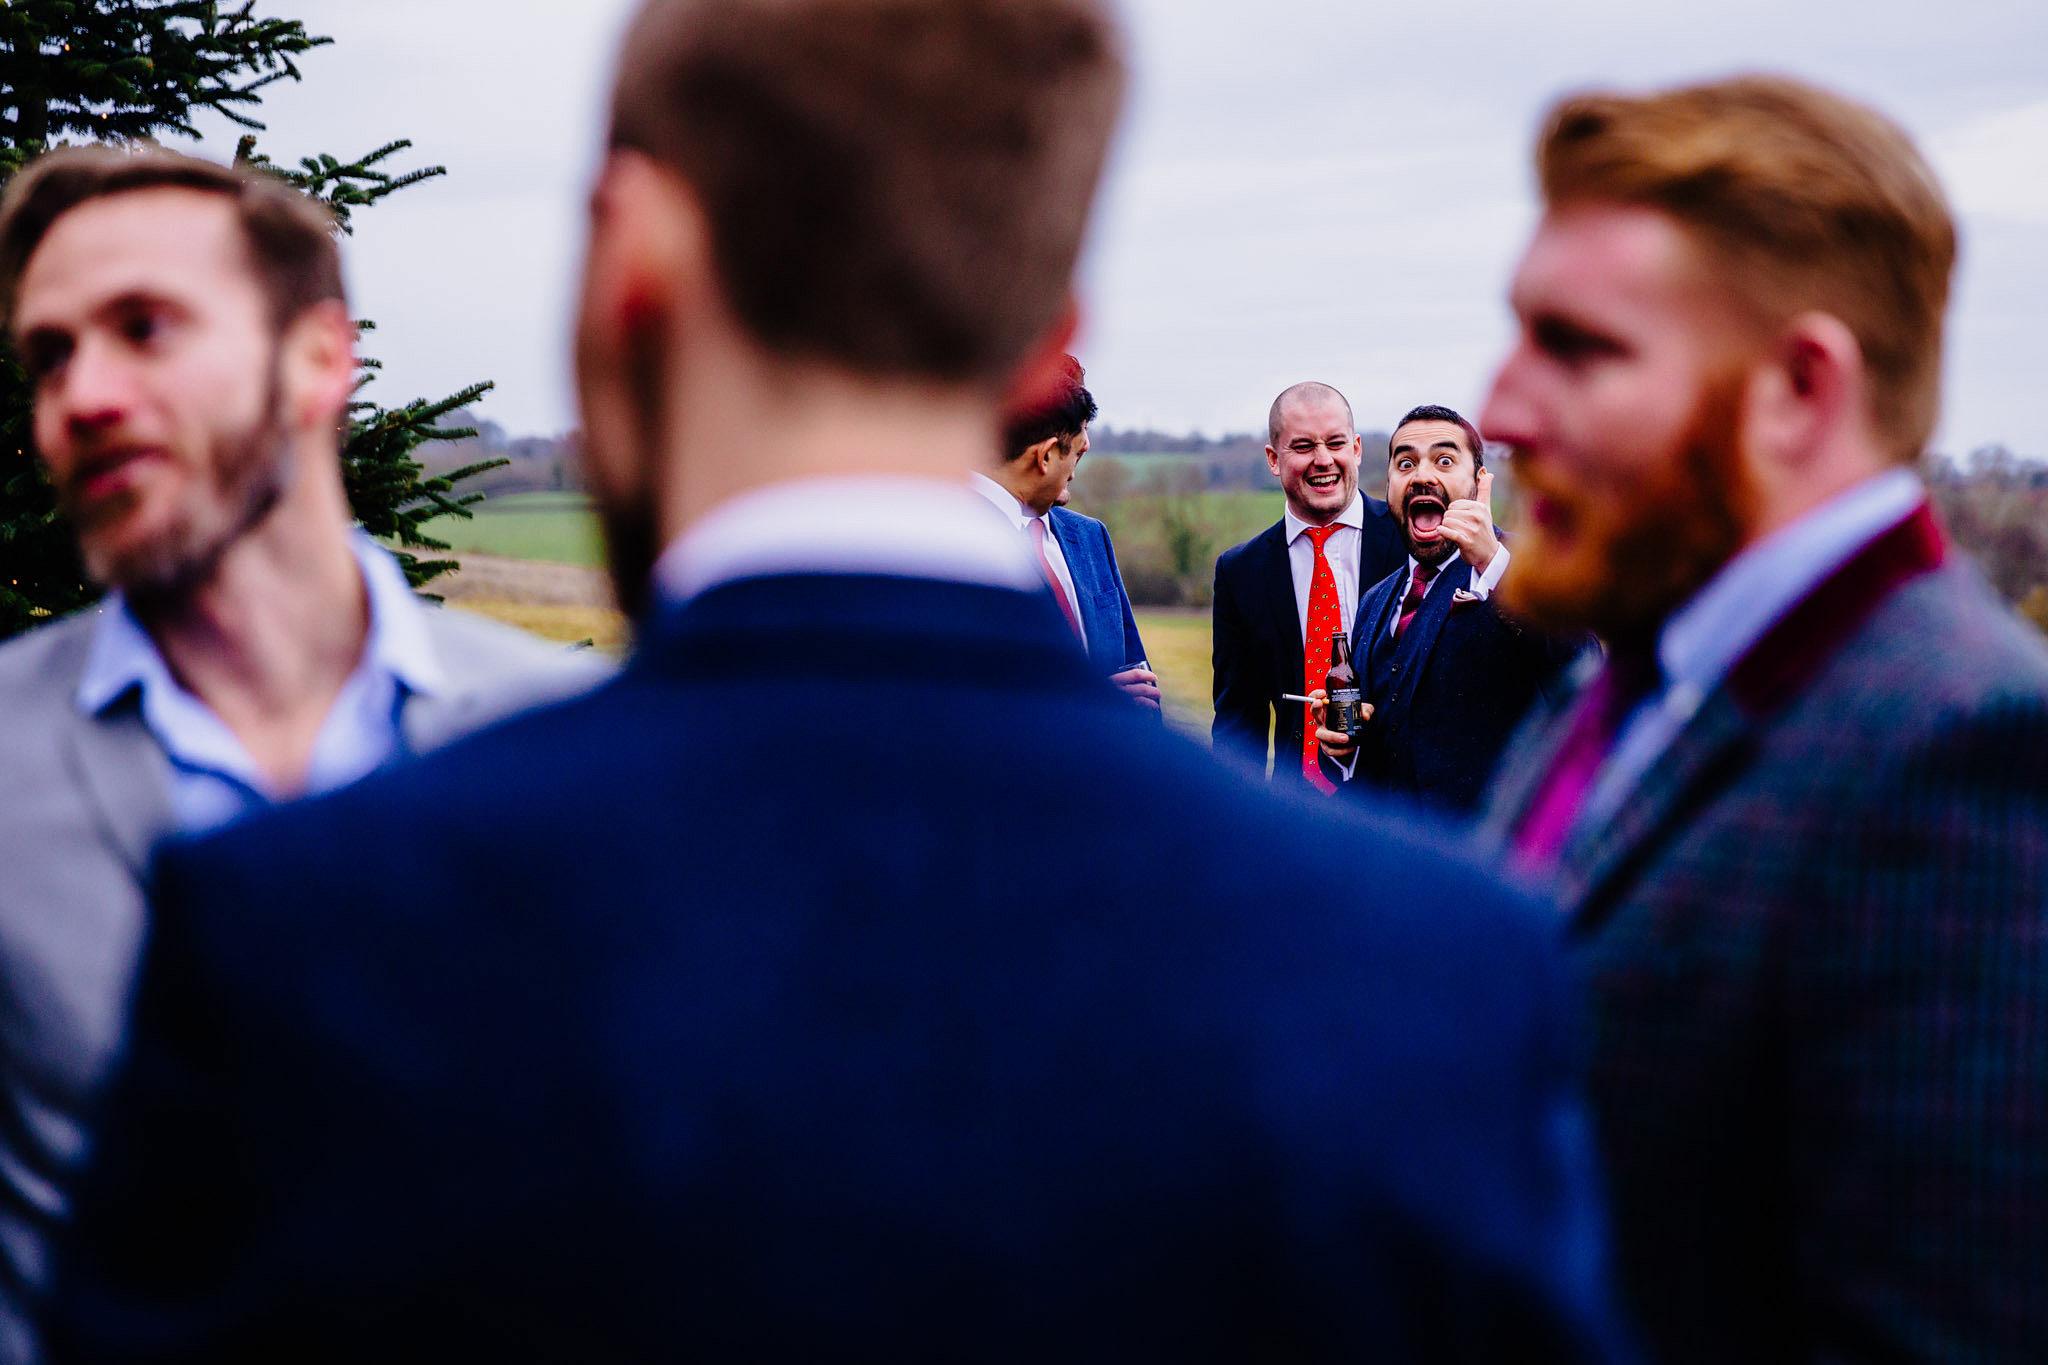 a guest having fun at a wedding